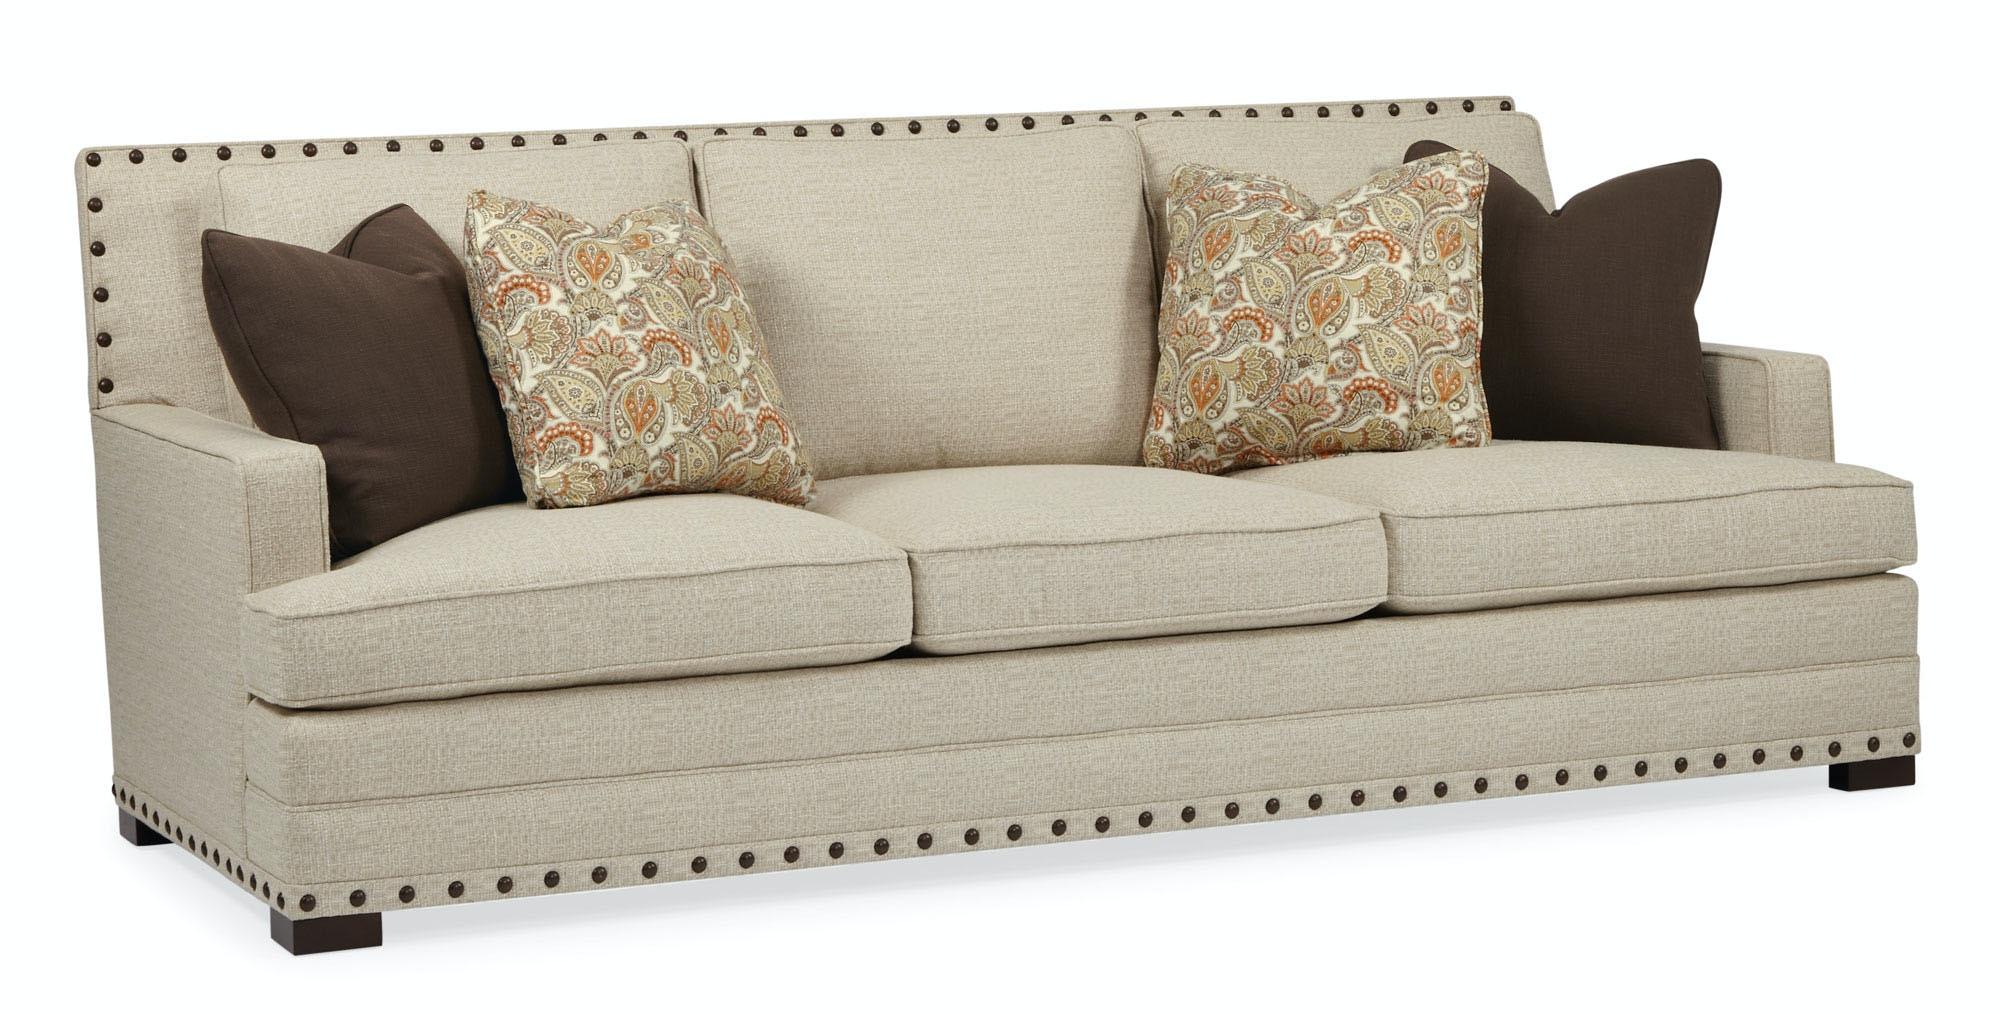 Bernhardt Sofa Bed Modern Sofa Best As Flexsteel Sofa For Sofa